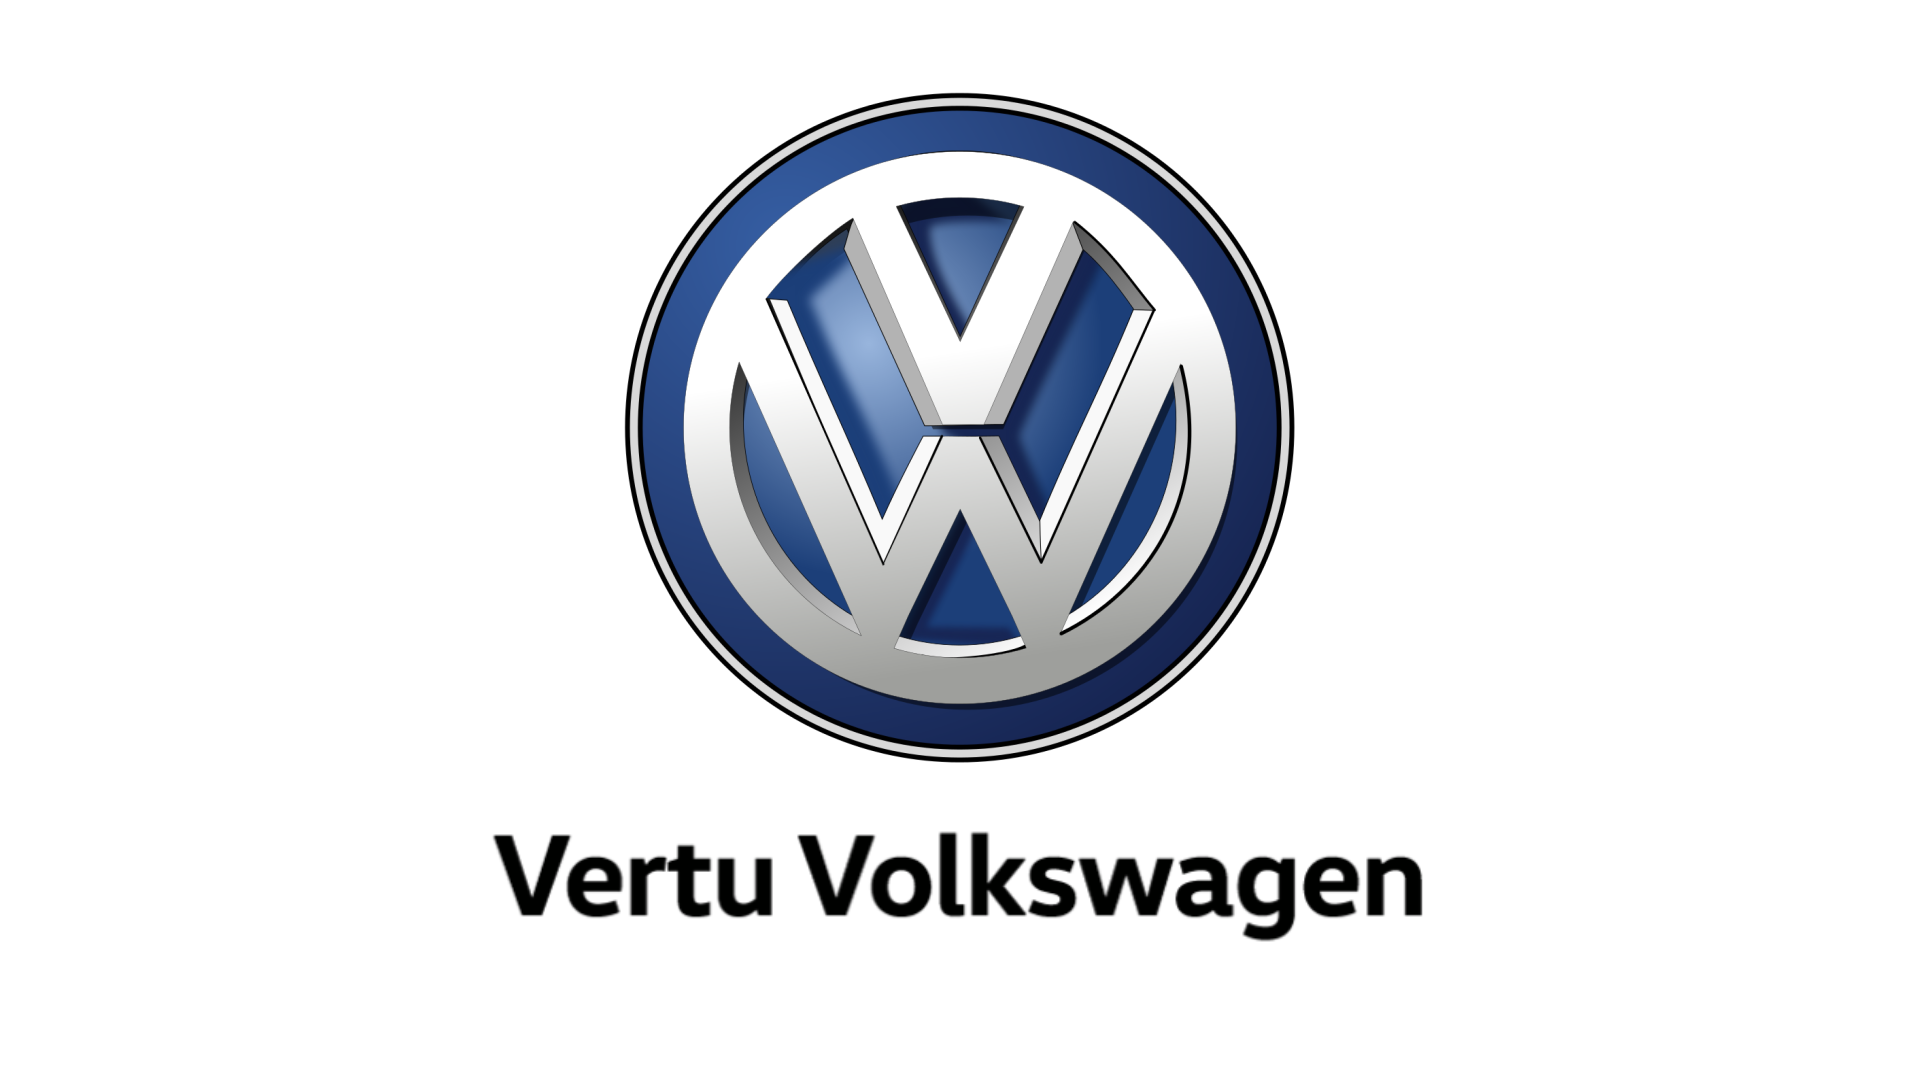 Vertu Volkswagen Hereford Logo